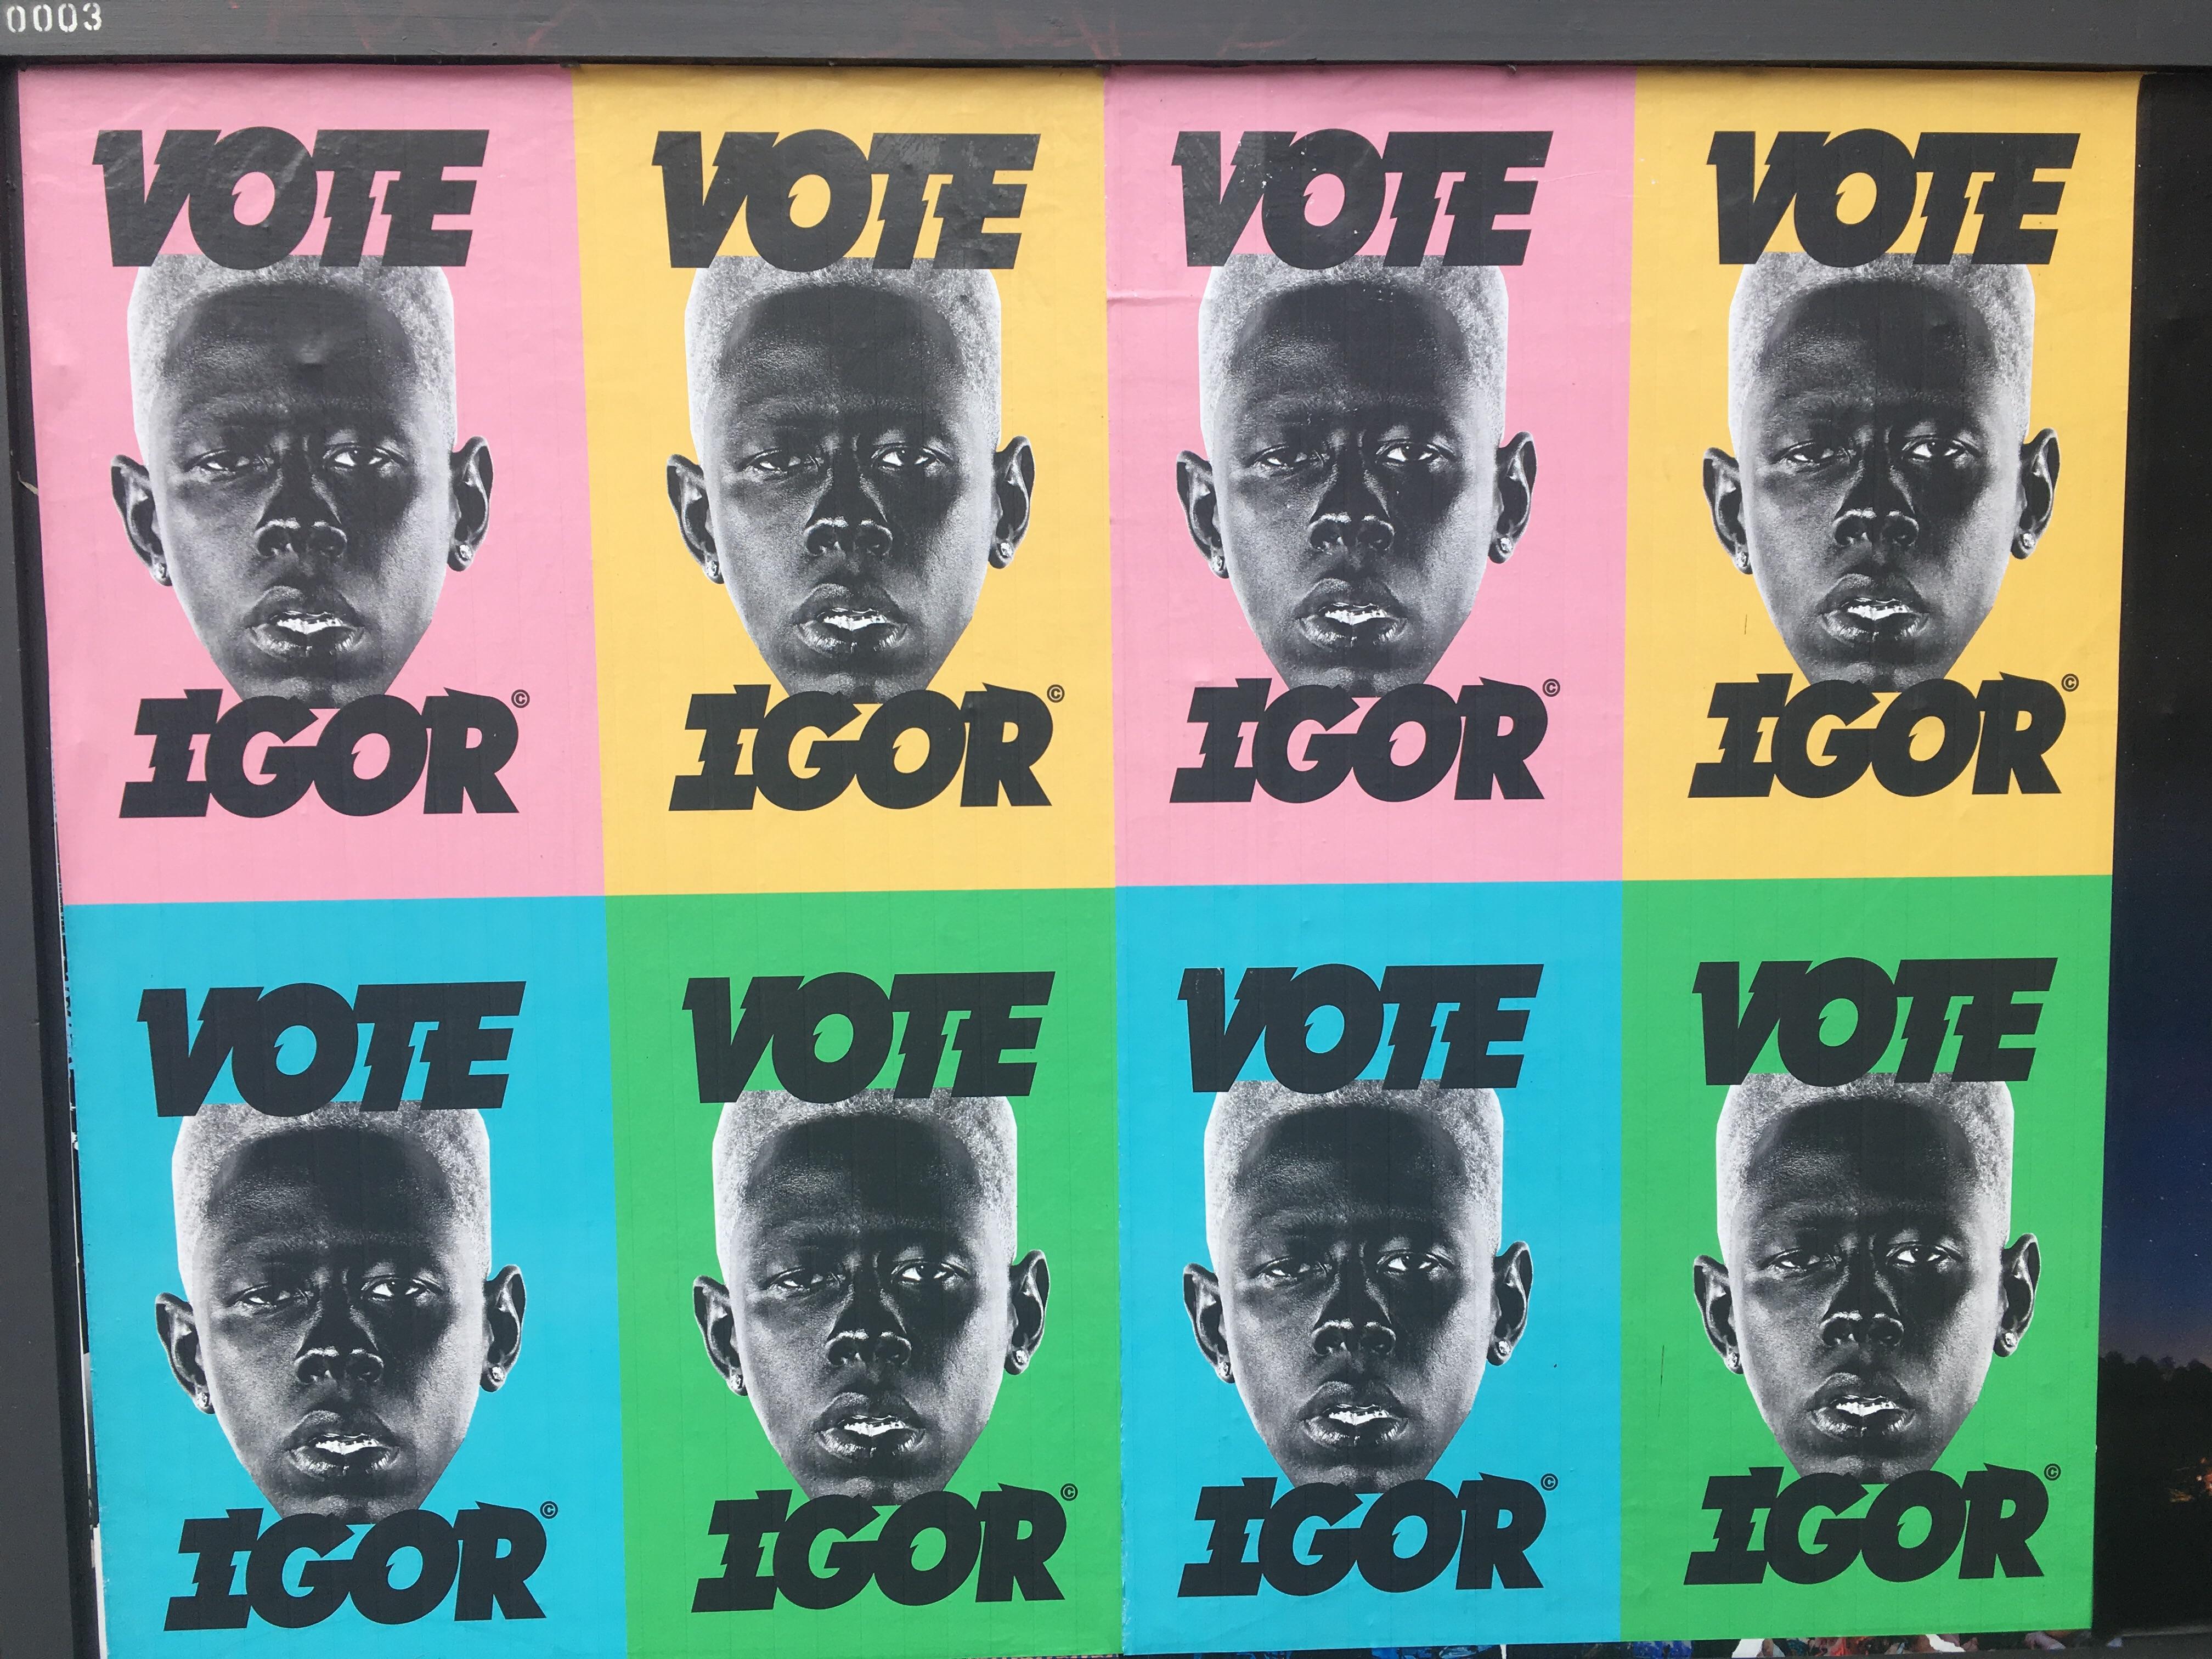 vote igor found in birmingham england